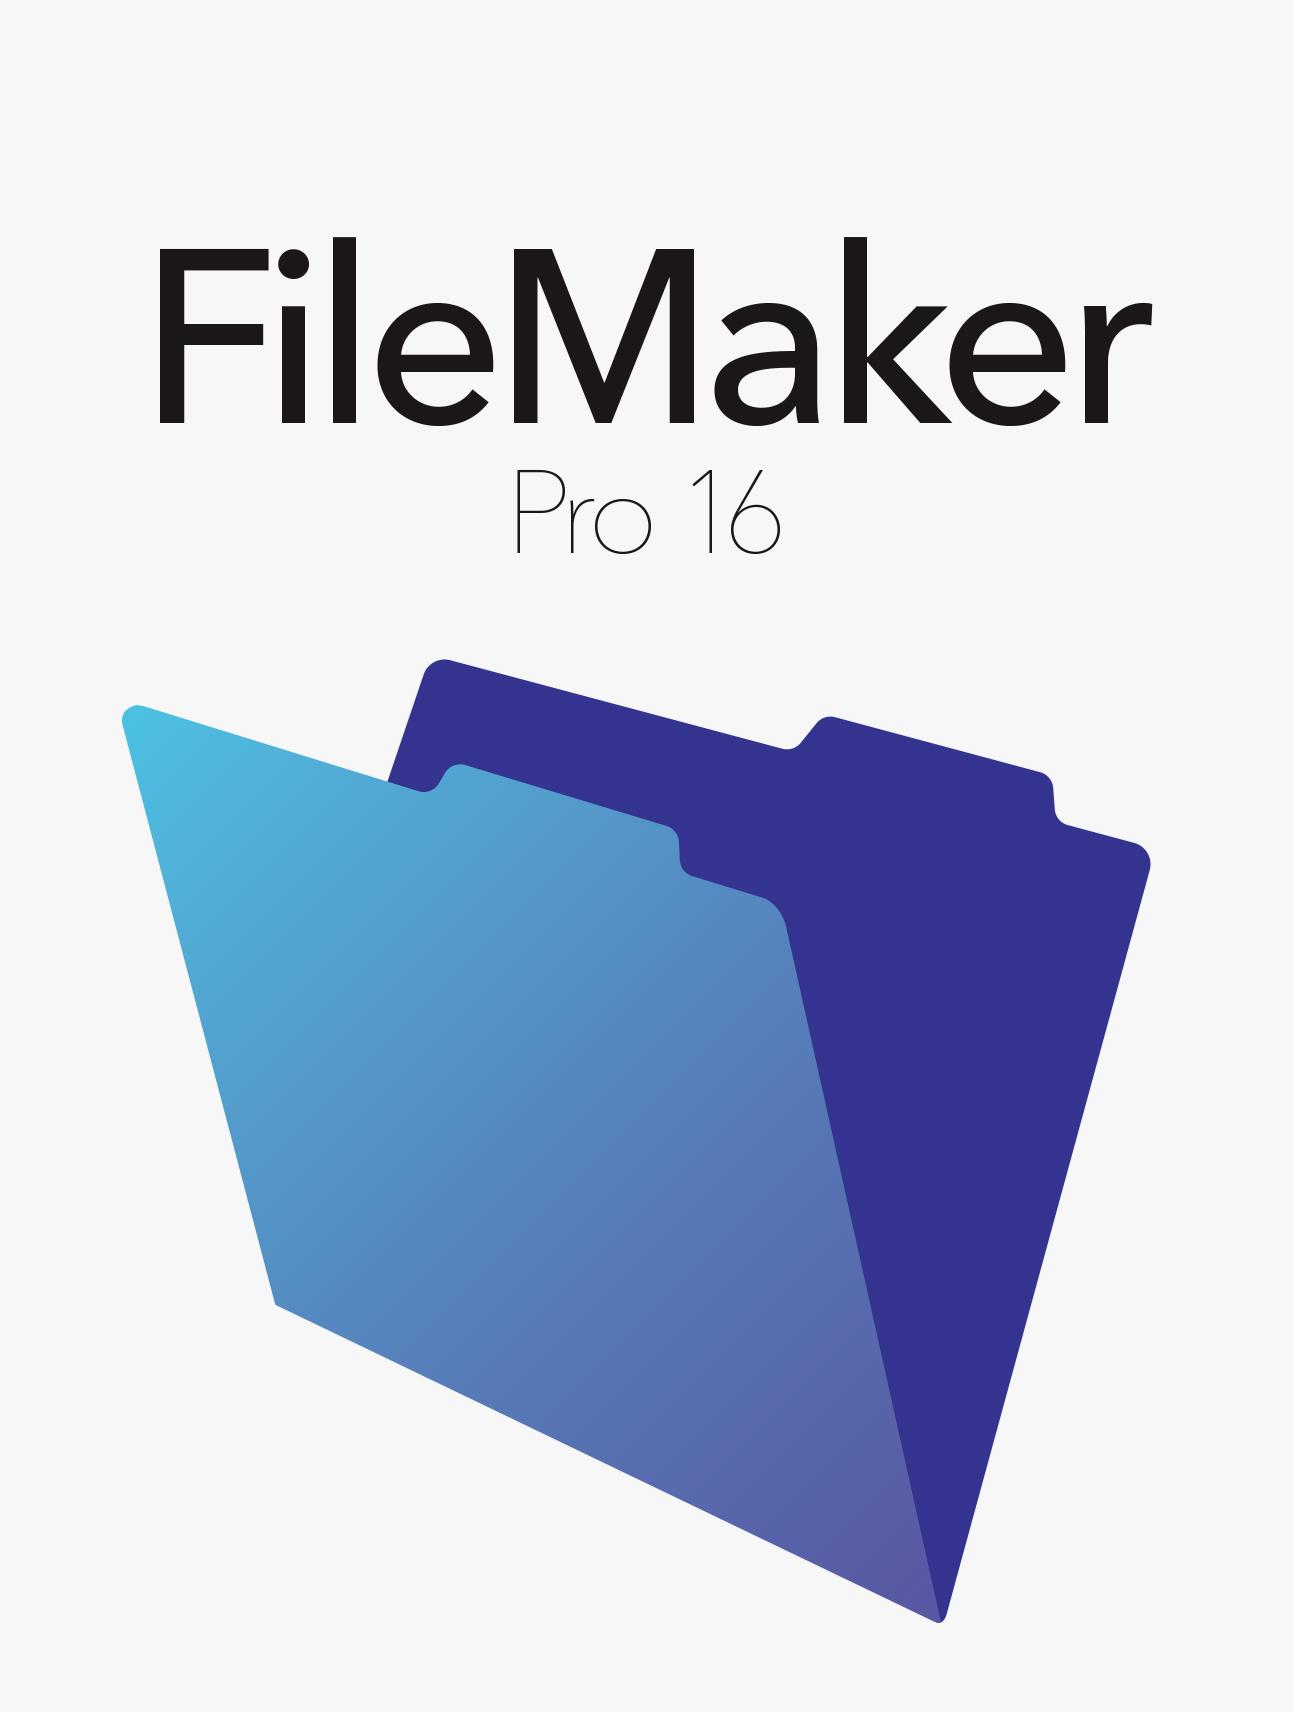 Filemaker pro 13 advanced best price